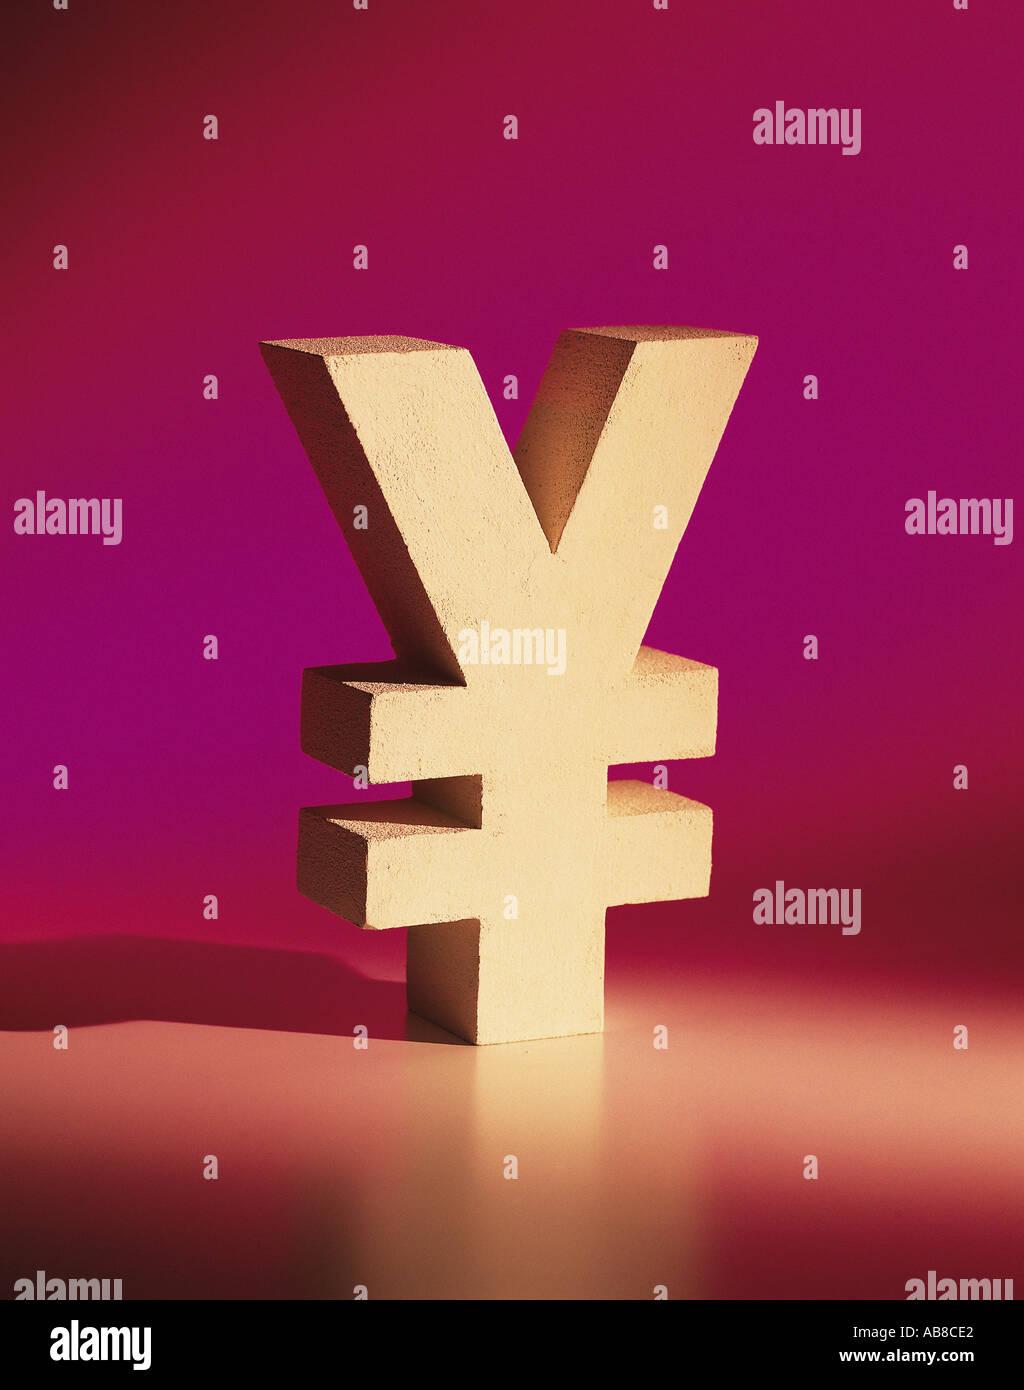 Yen - Stock Image